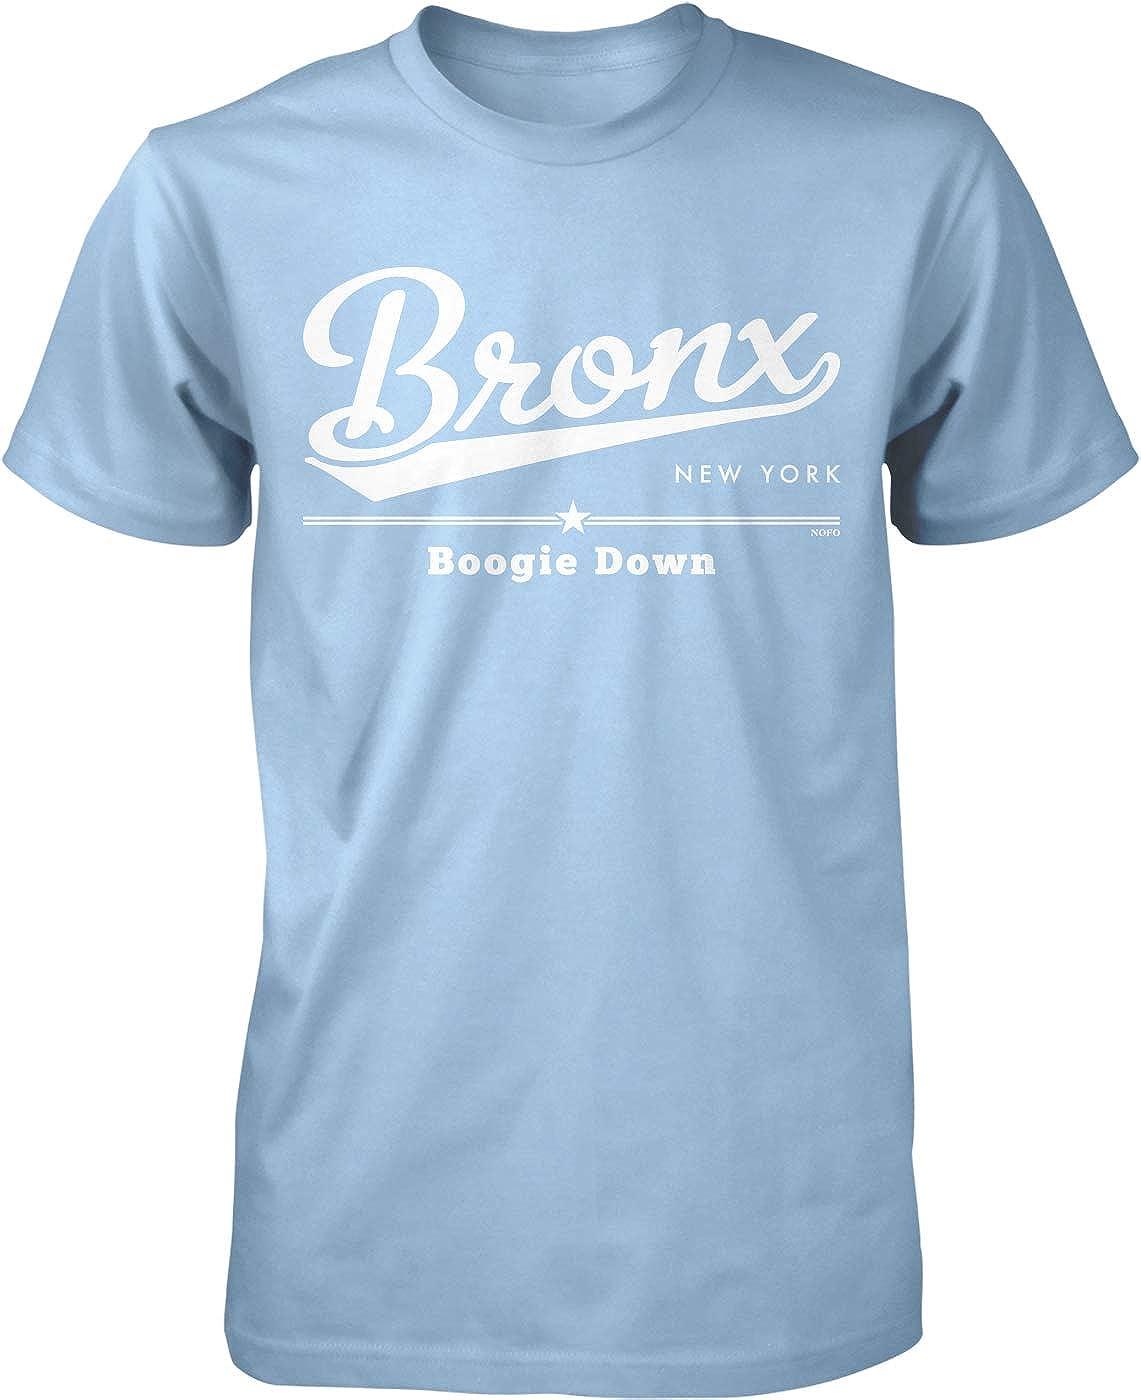 Hoodteez Bronx, New York, Boogie Down Men's T-Shirt